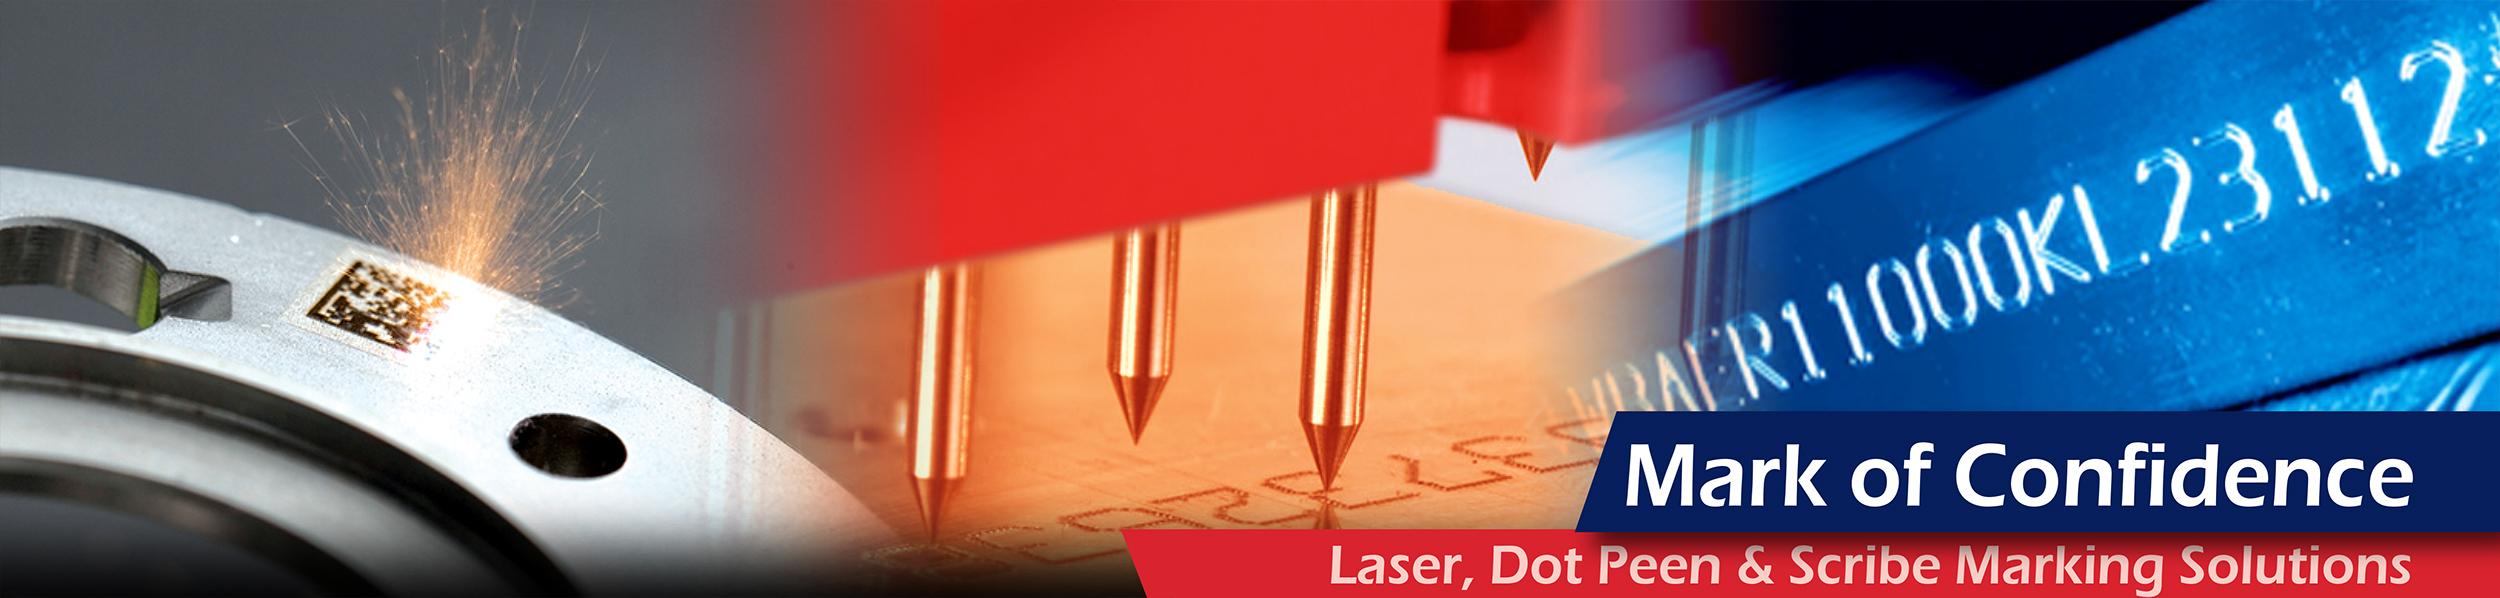 Telesis, Laser Marking, Dot Peen Marking, & Scribe Marking Systems since 1971